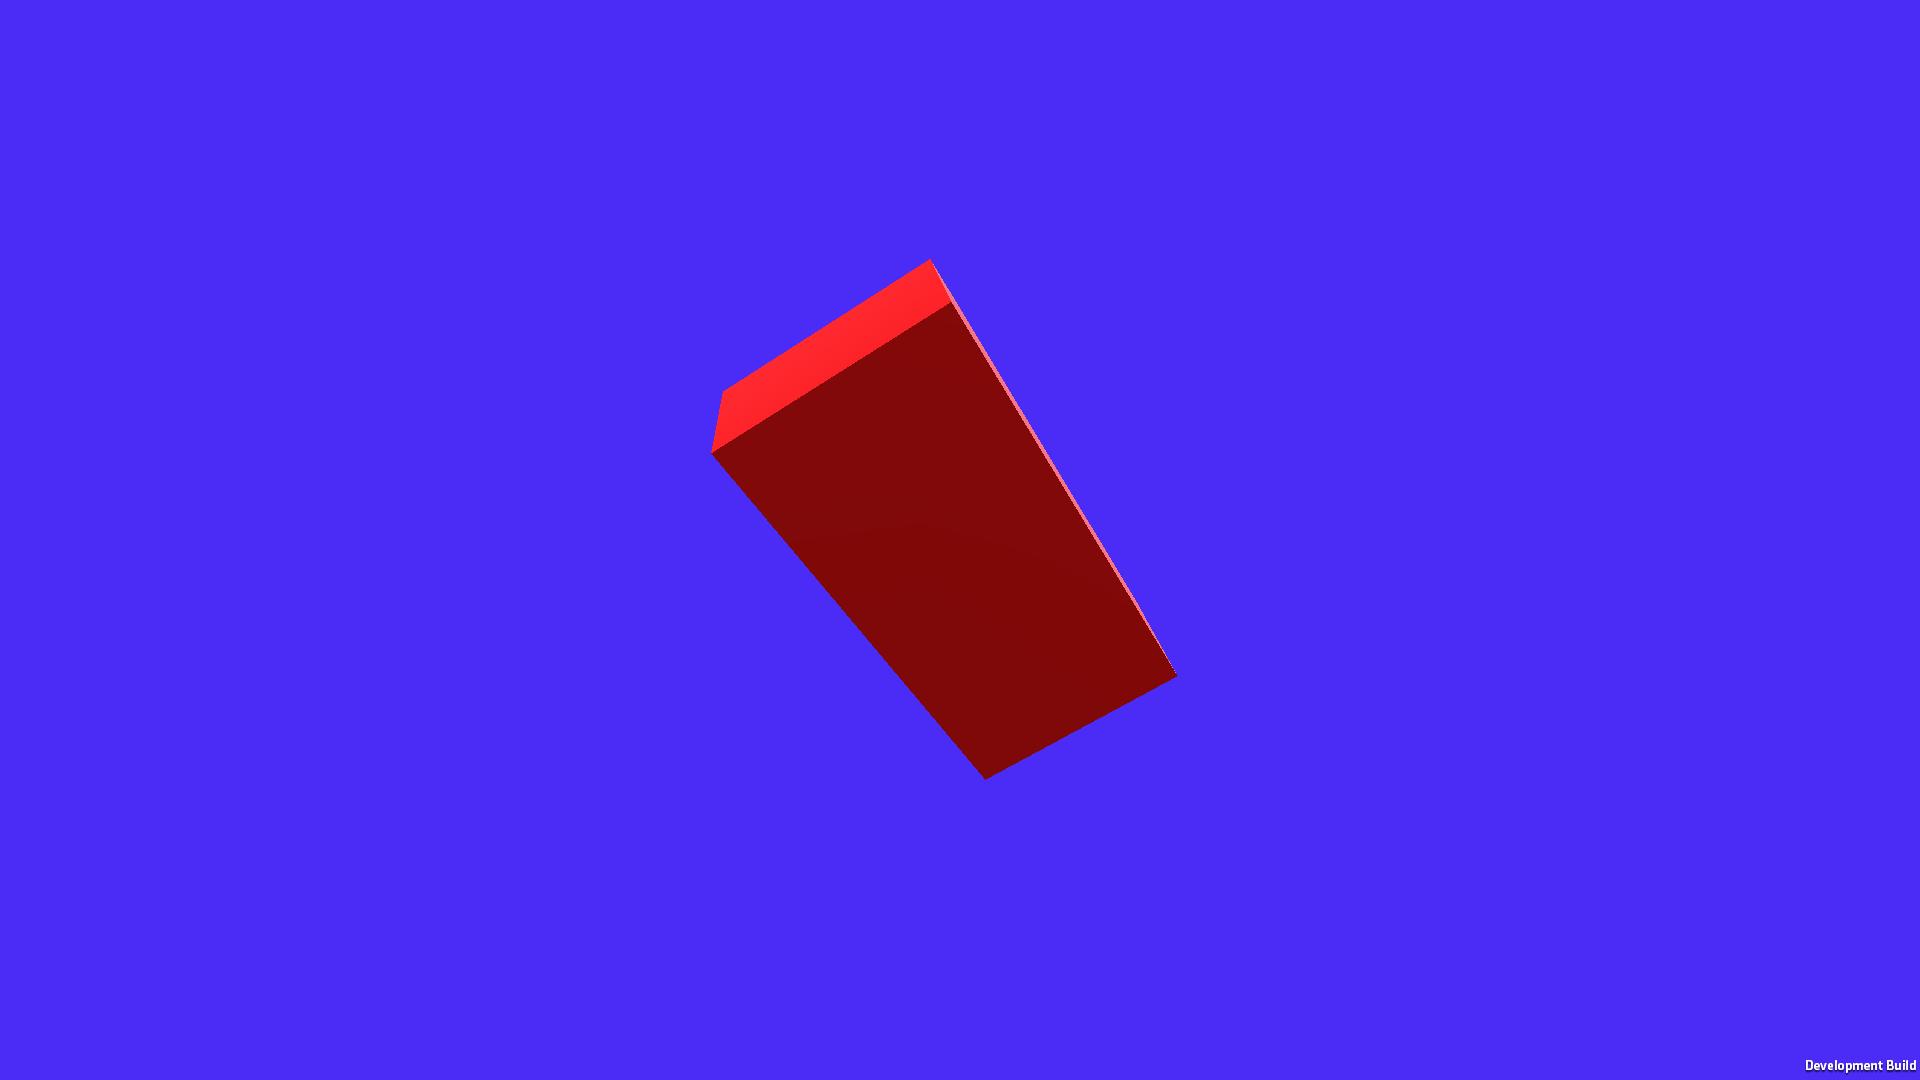 Holograms 100 tutorial errors w/ Emulator — Mixed Reality